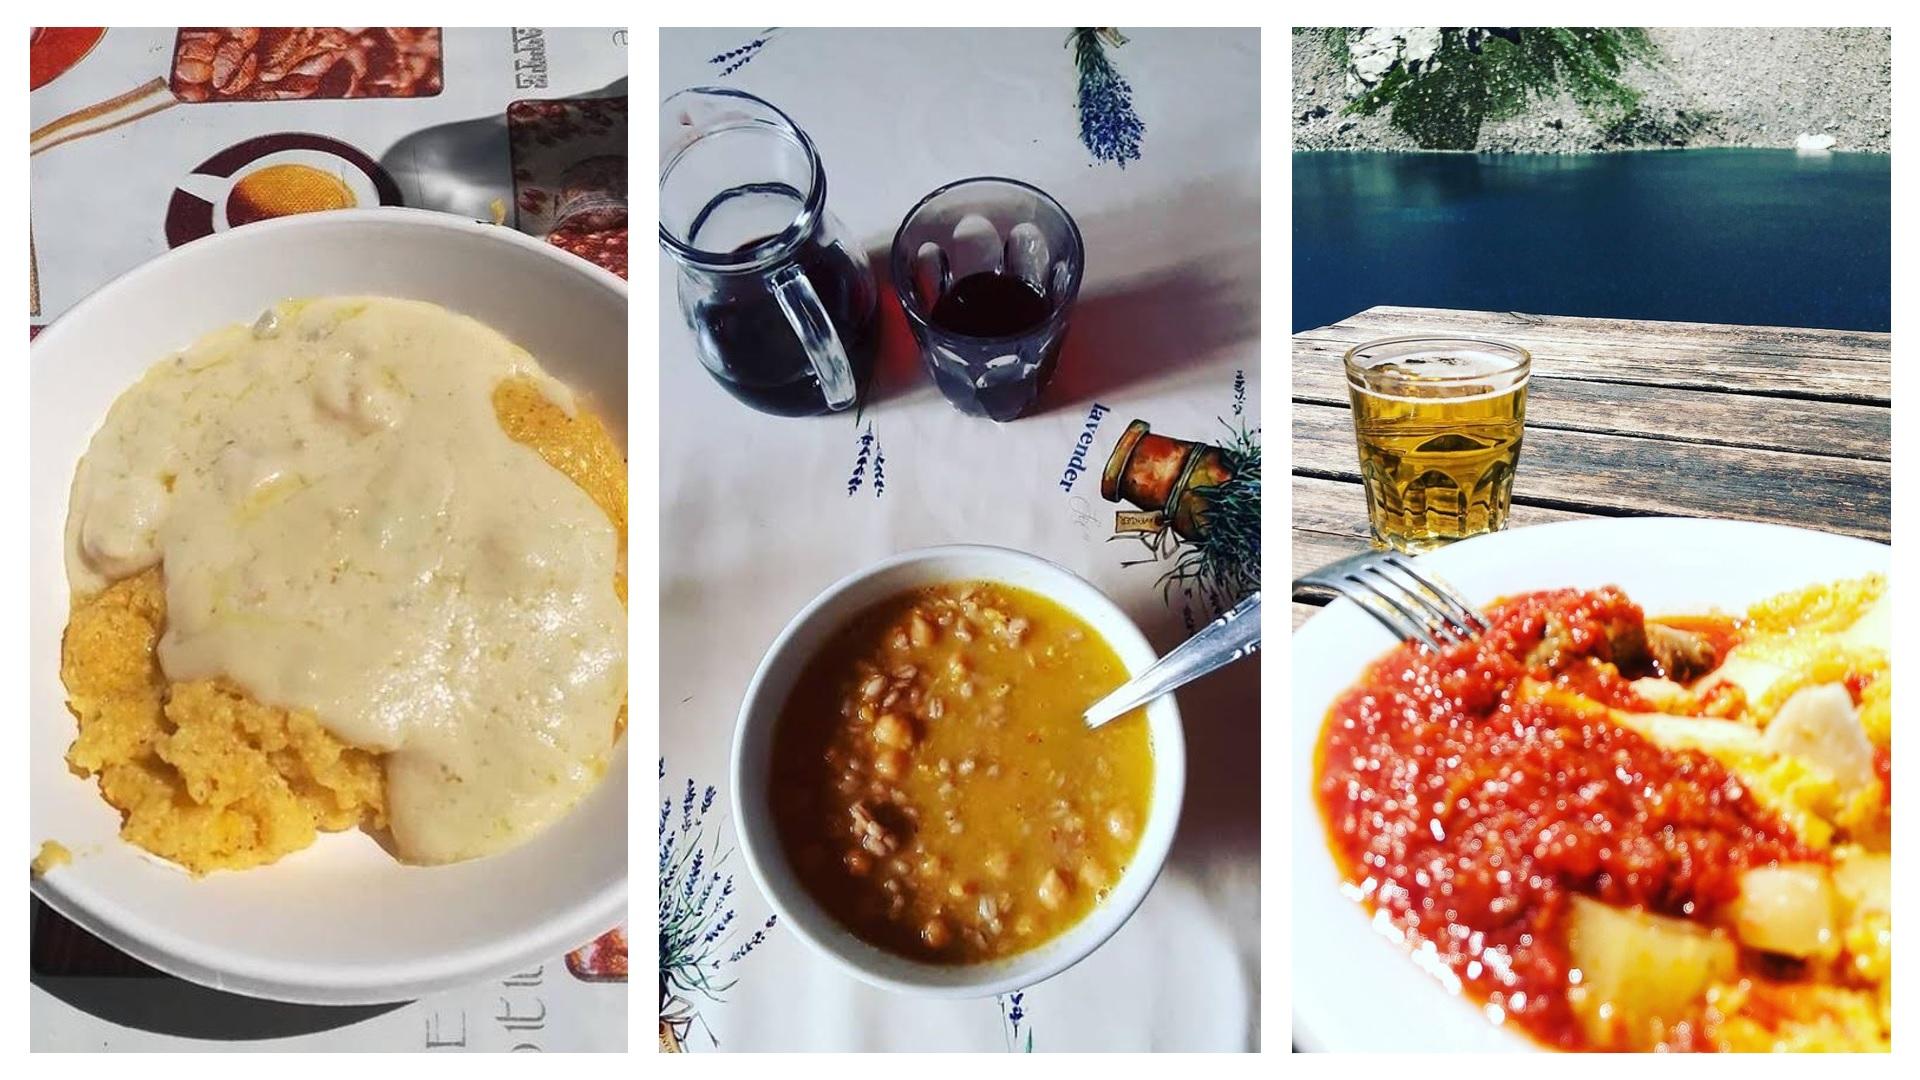 rifugio emilio questa - enjoy your meal